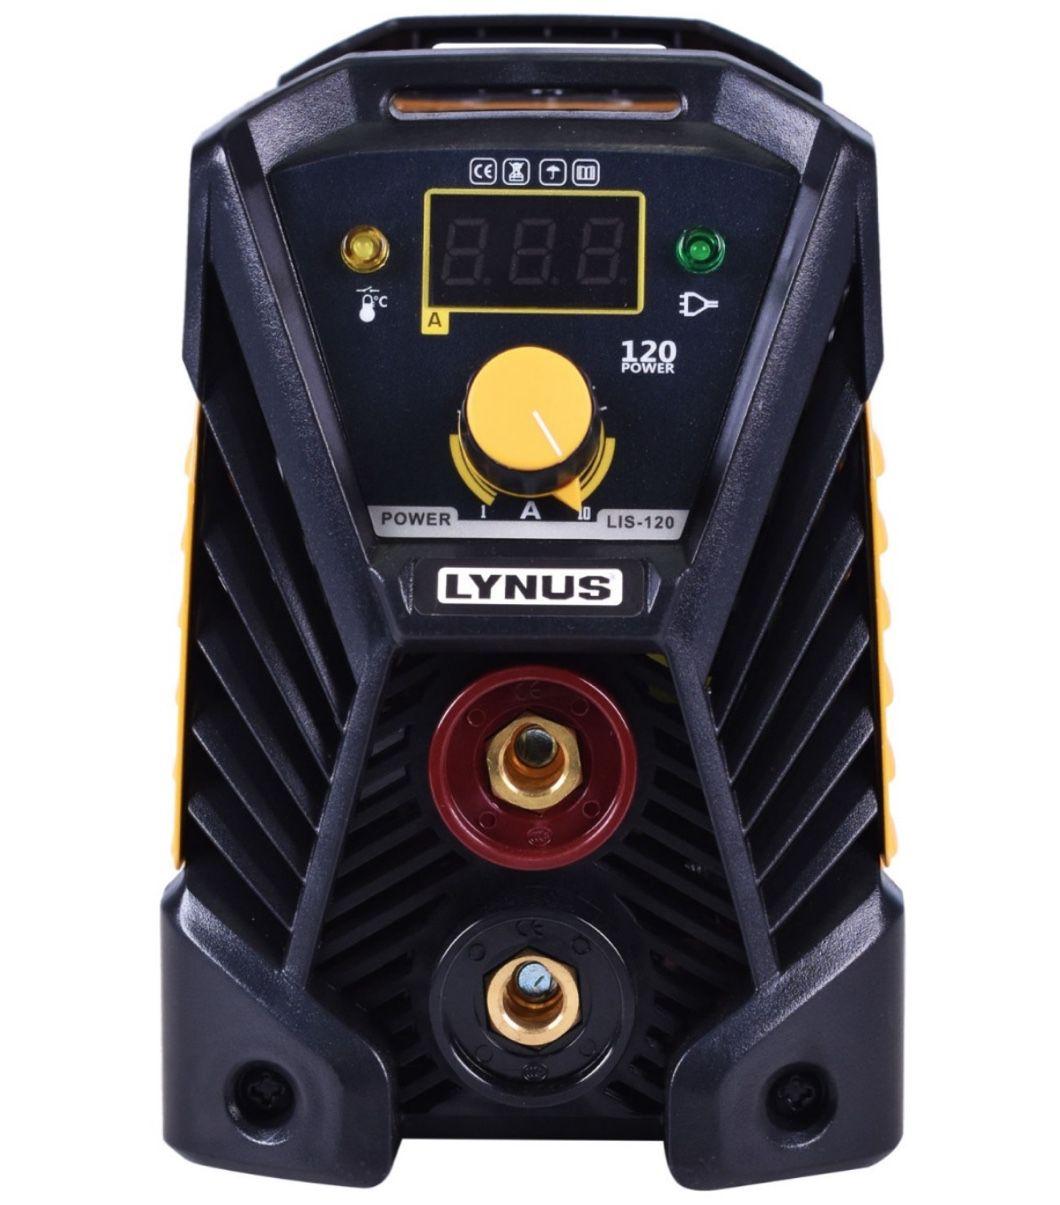 Inversora Solda Lynus LIS-120 Power 220v